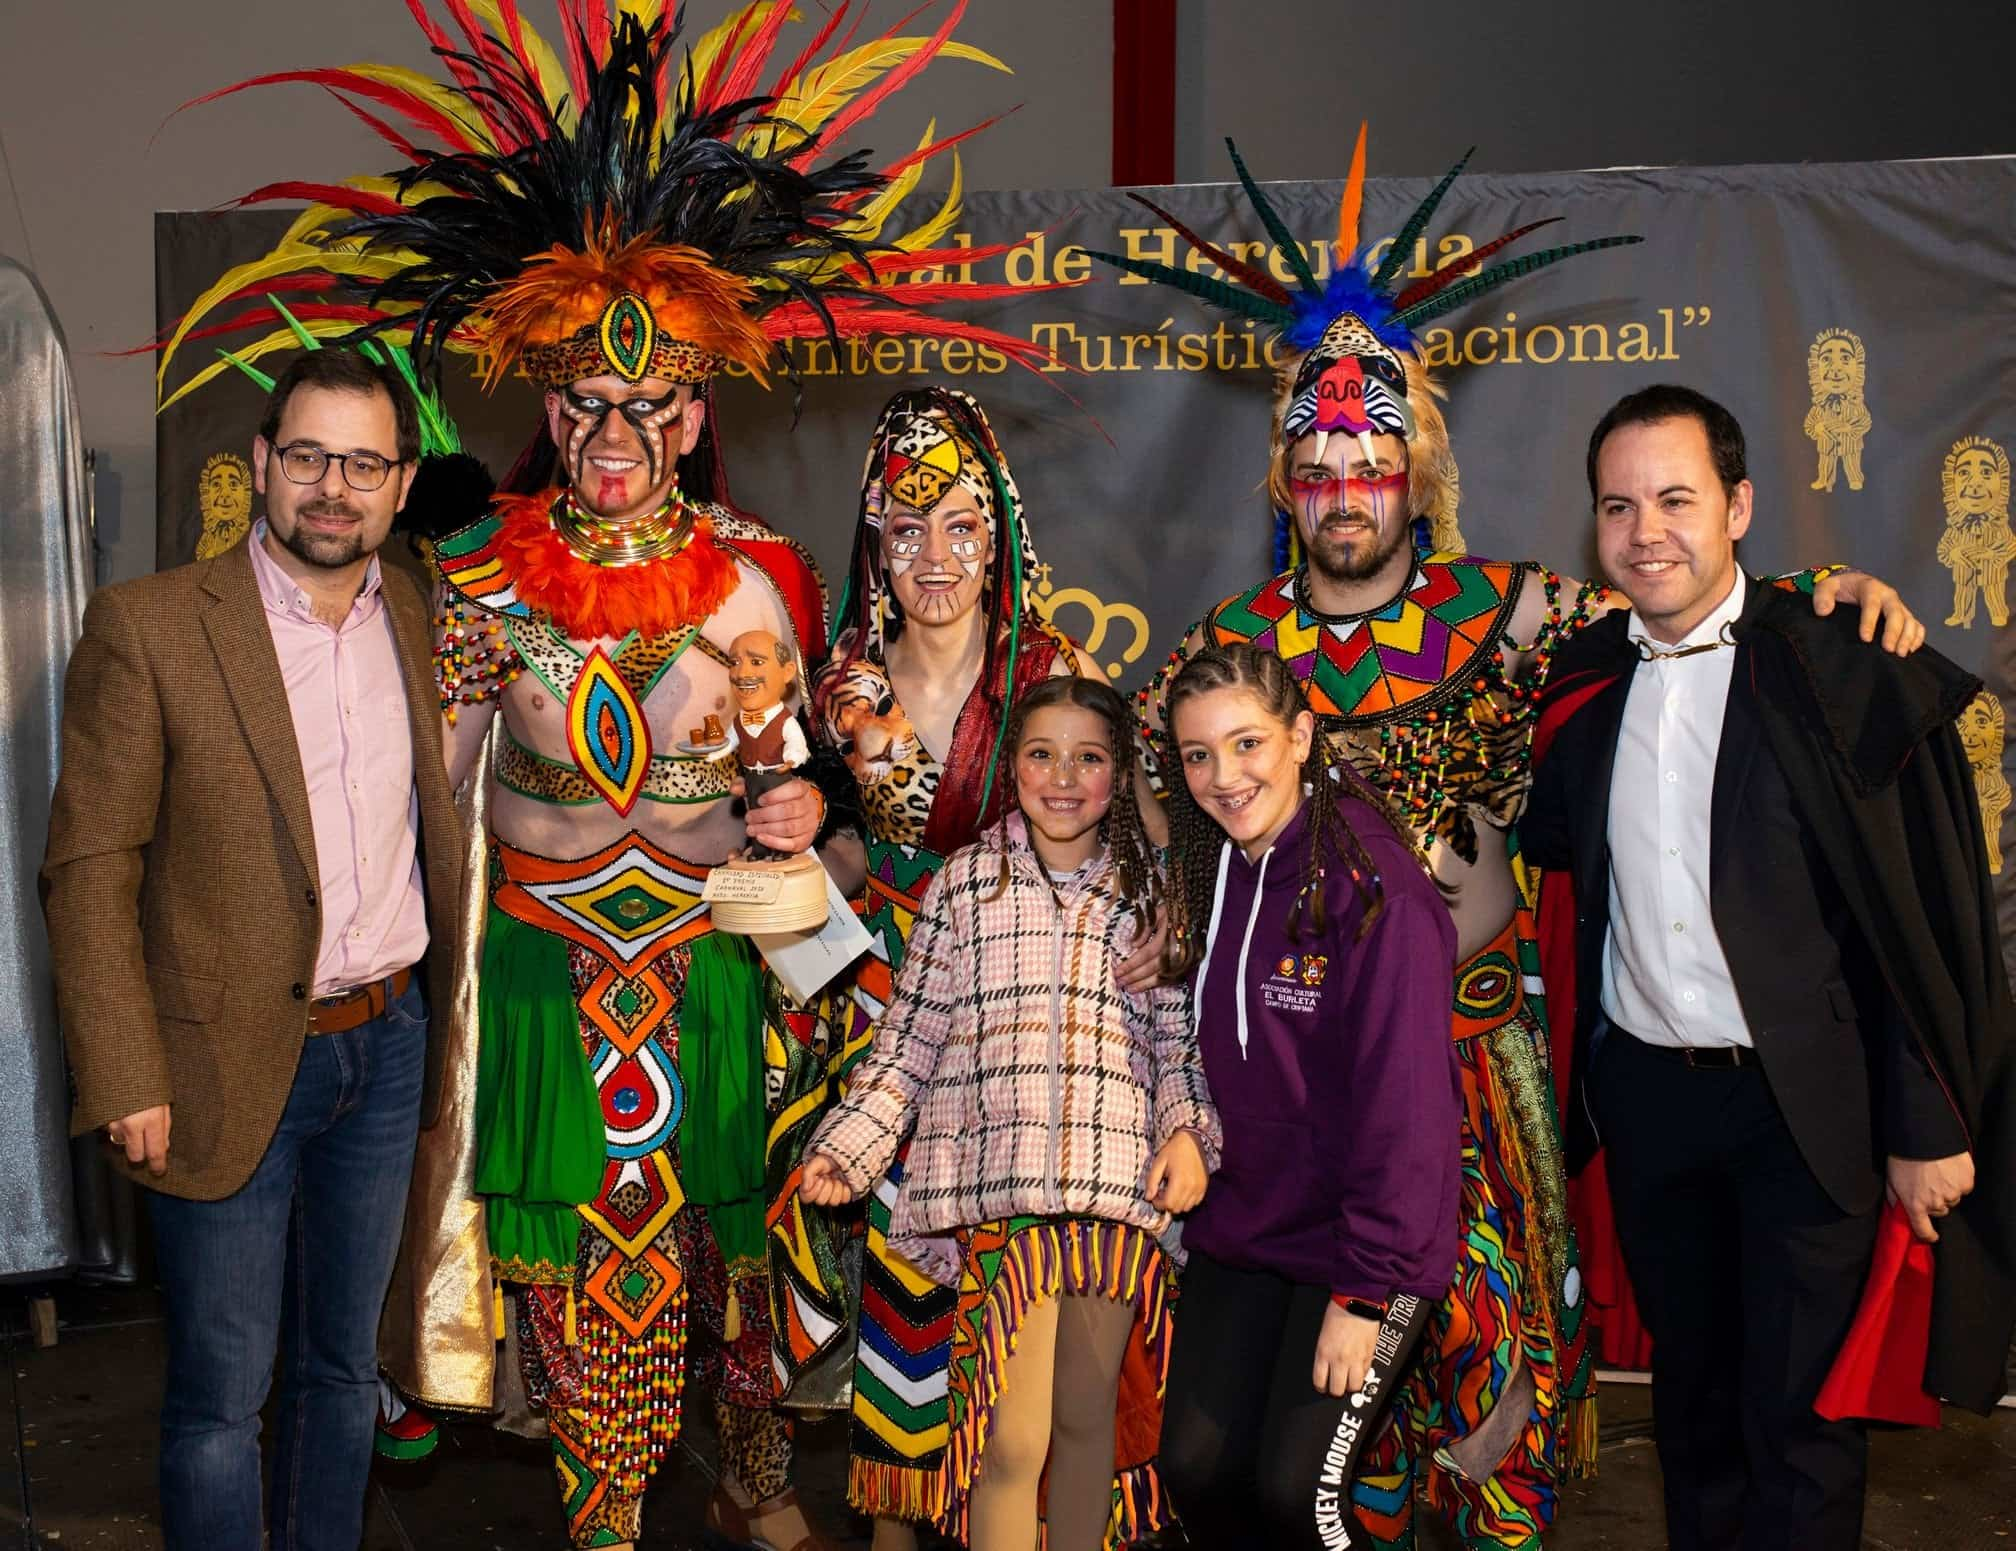 Carnaval de herencia 2020 ofertorio 4 - Selección de fotografías del Ofertorio del Carnaval de Herencia